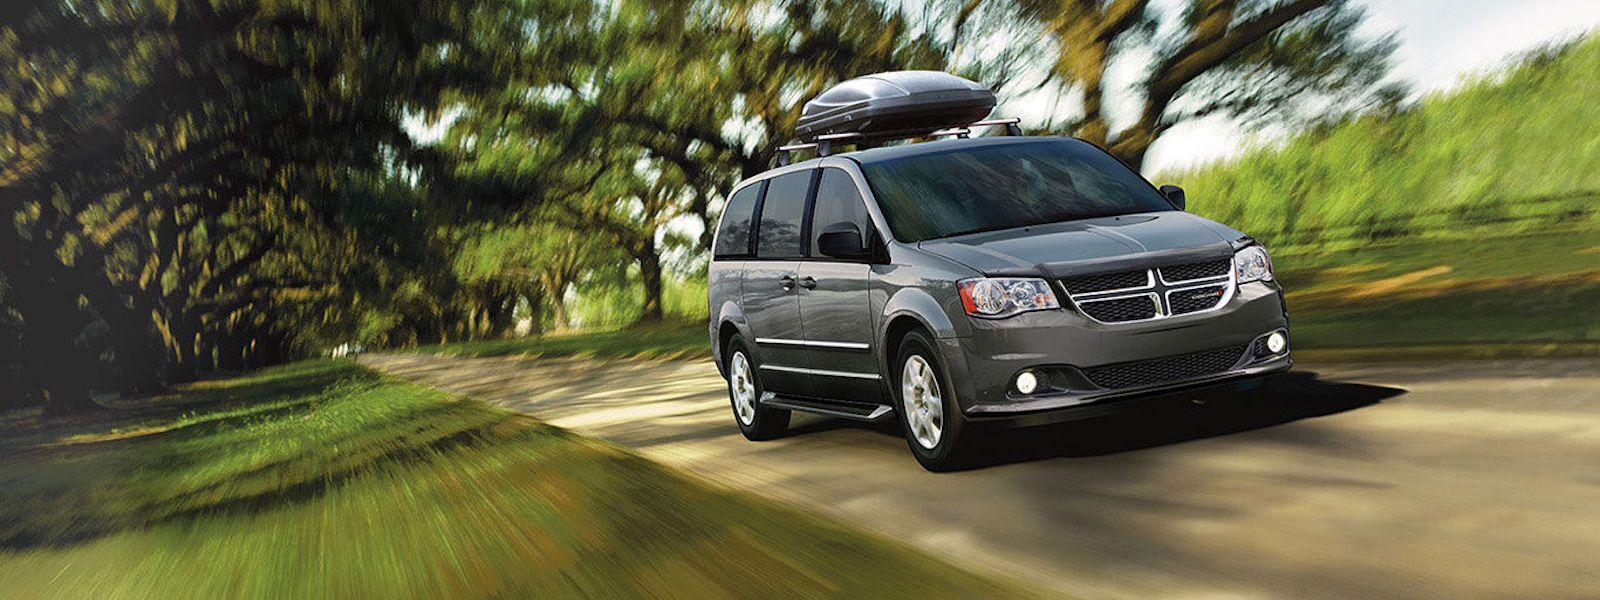 2016 Dodge Grand Caravan Performance